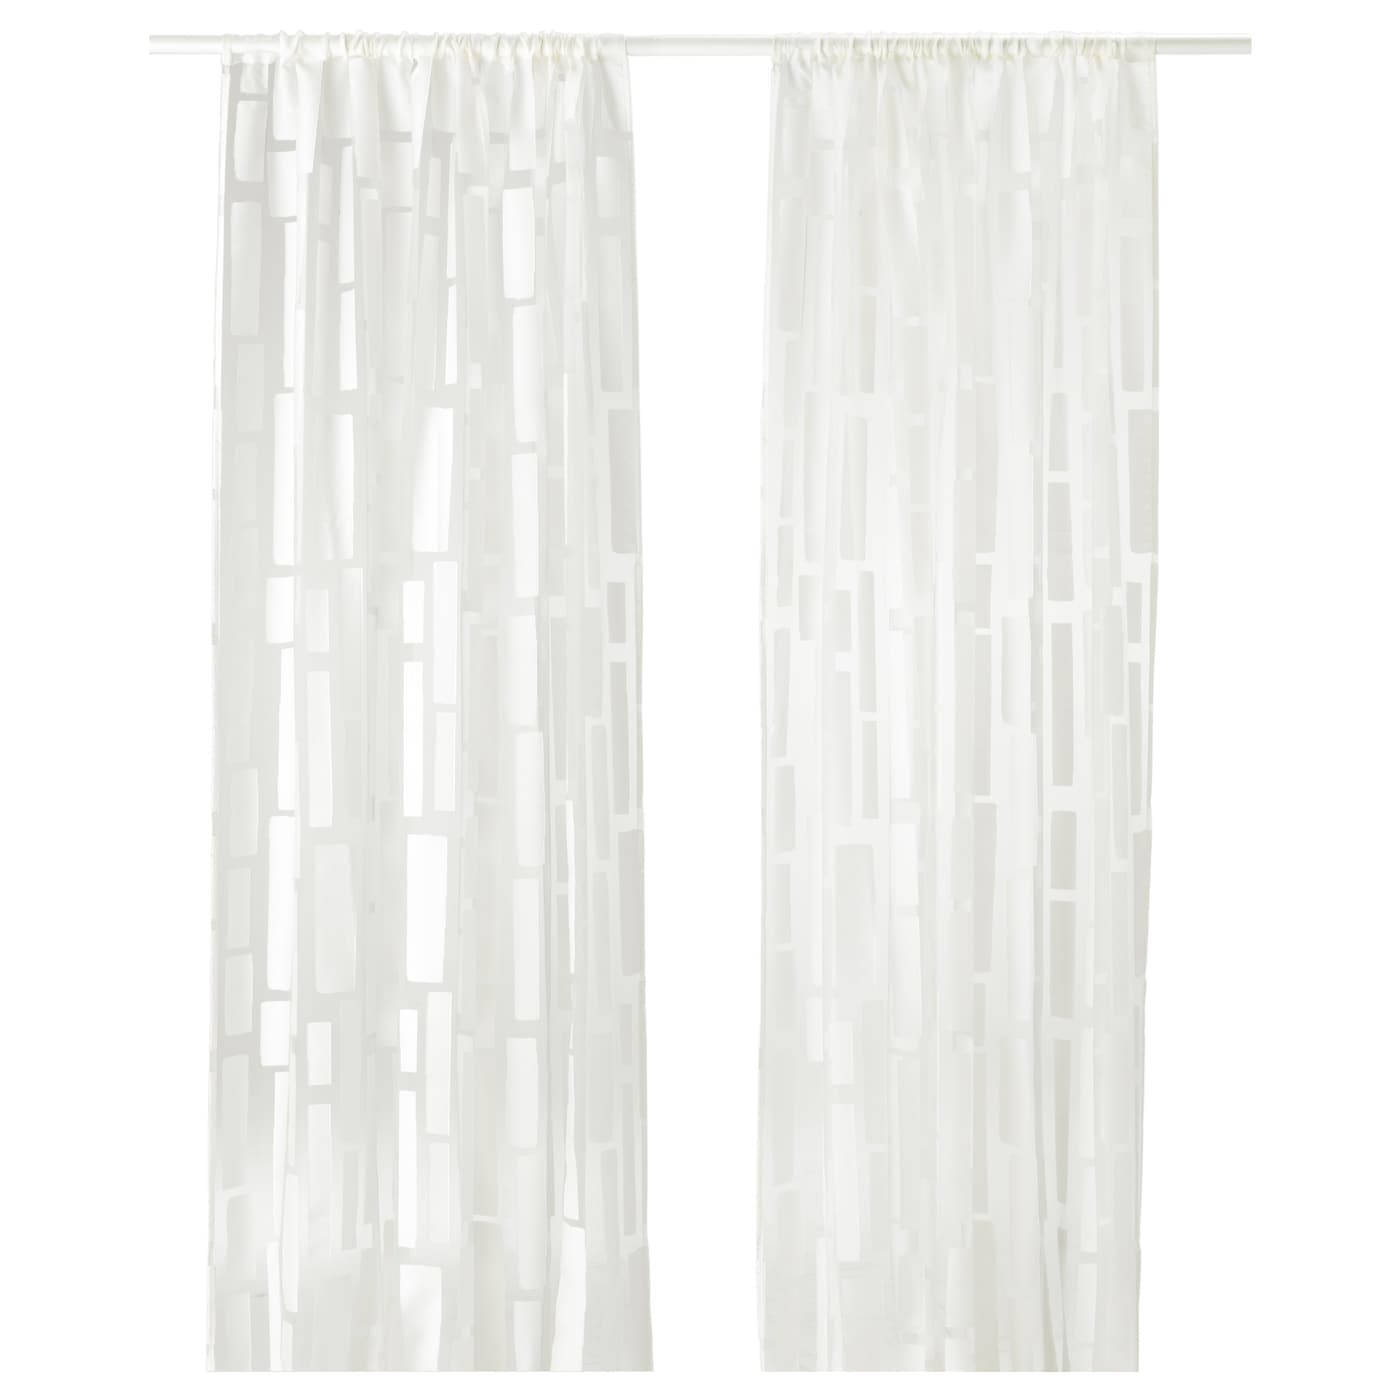 IKEA STRANDRÅG Sheer Curtains, 1 Pair